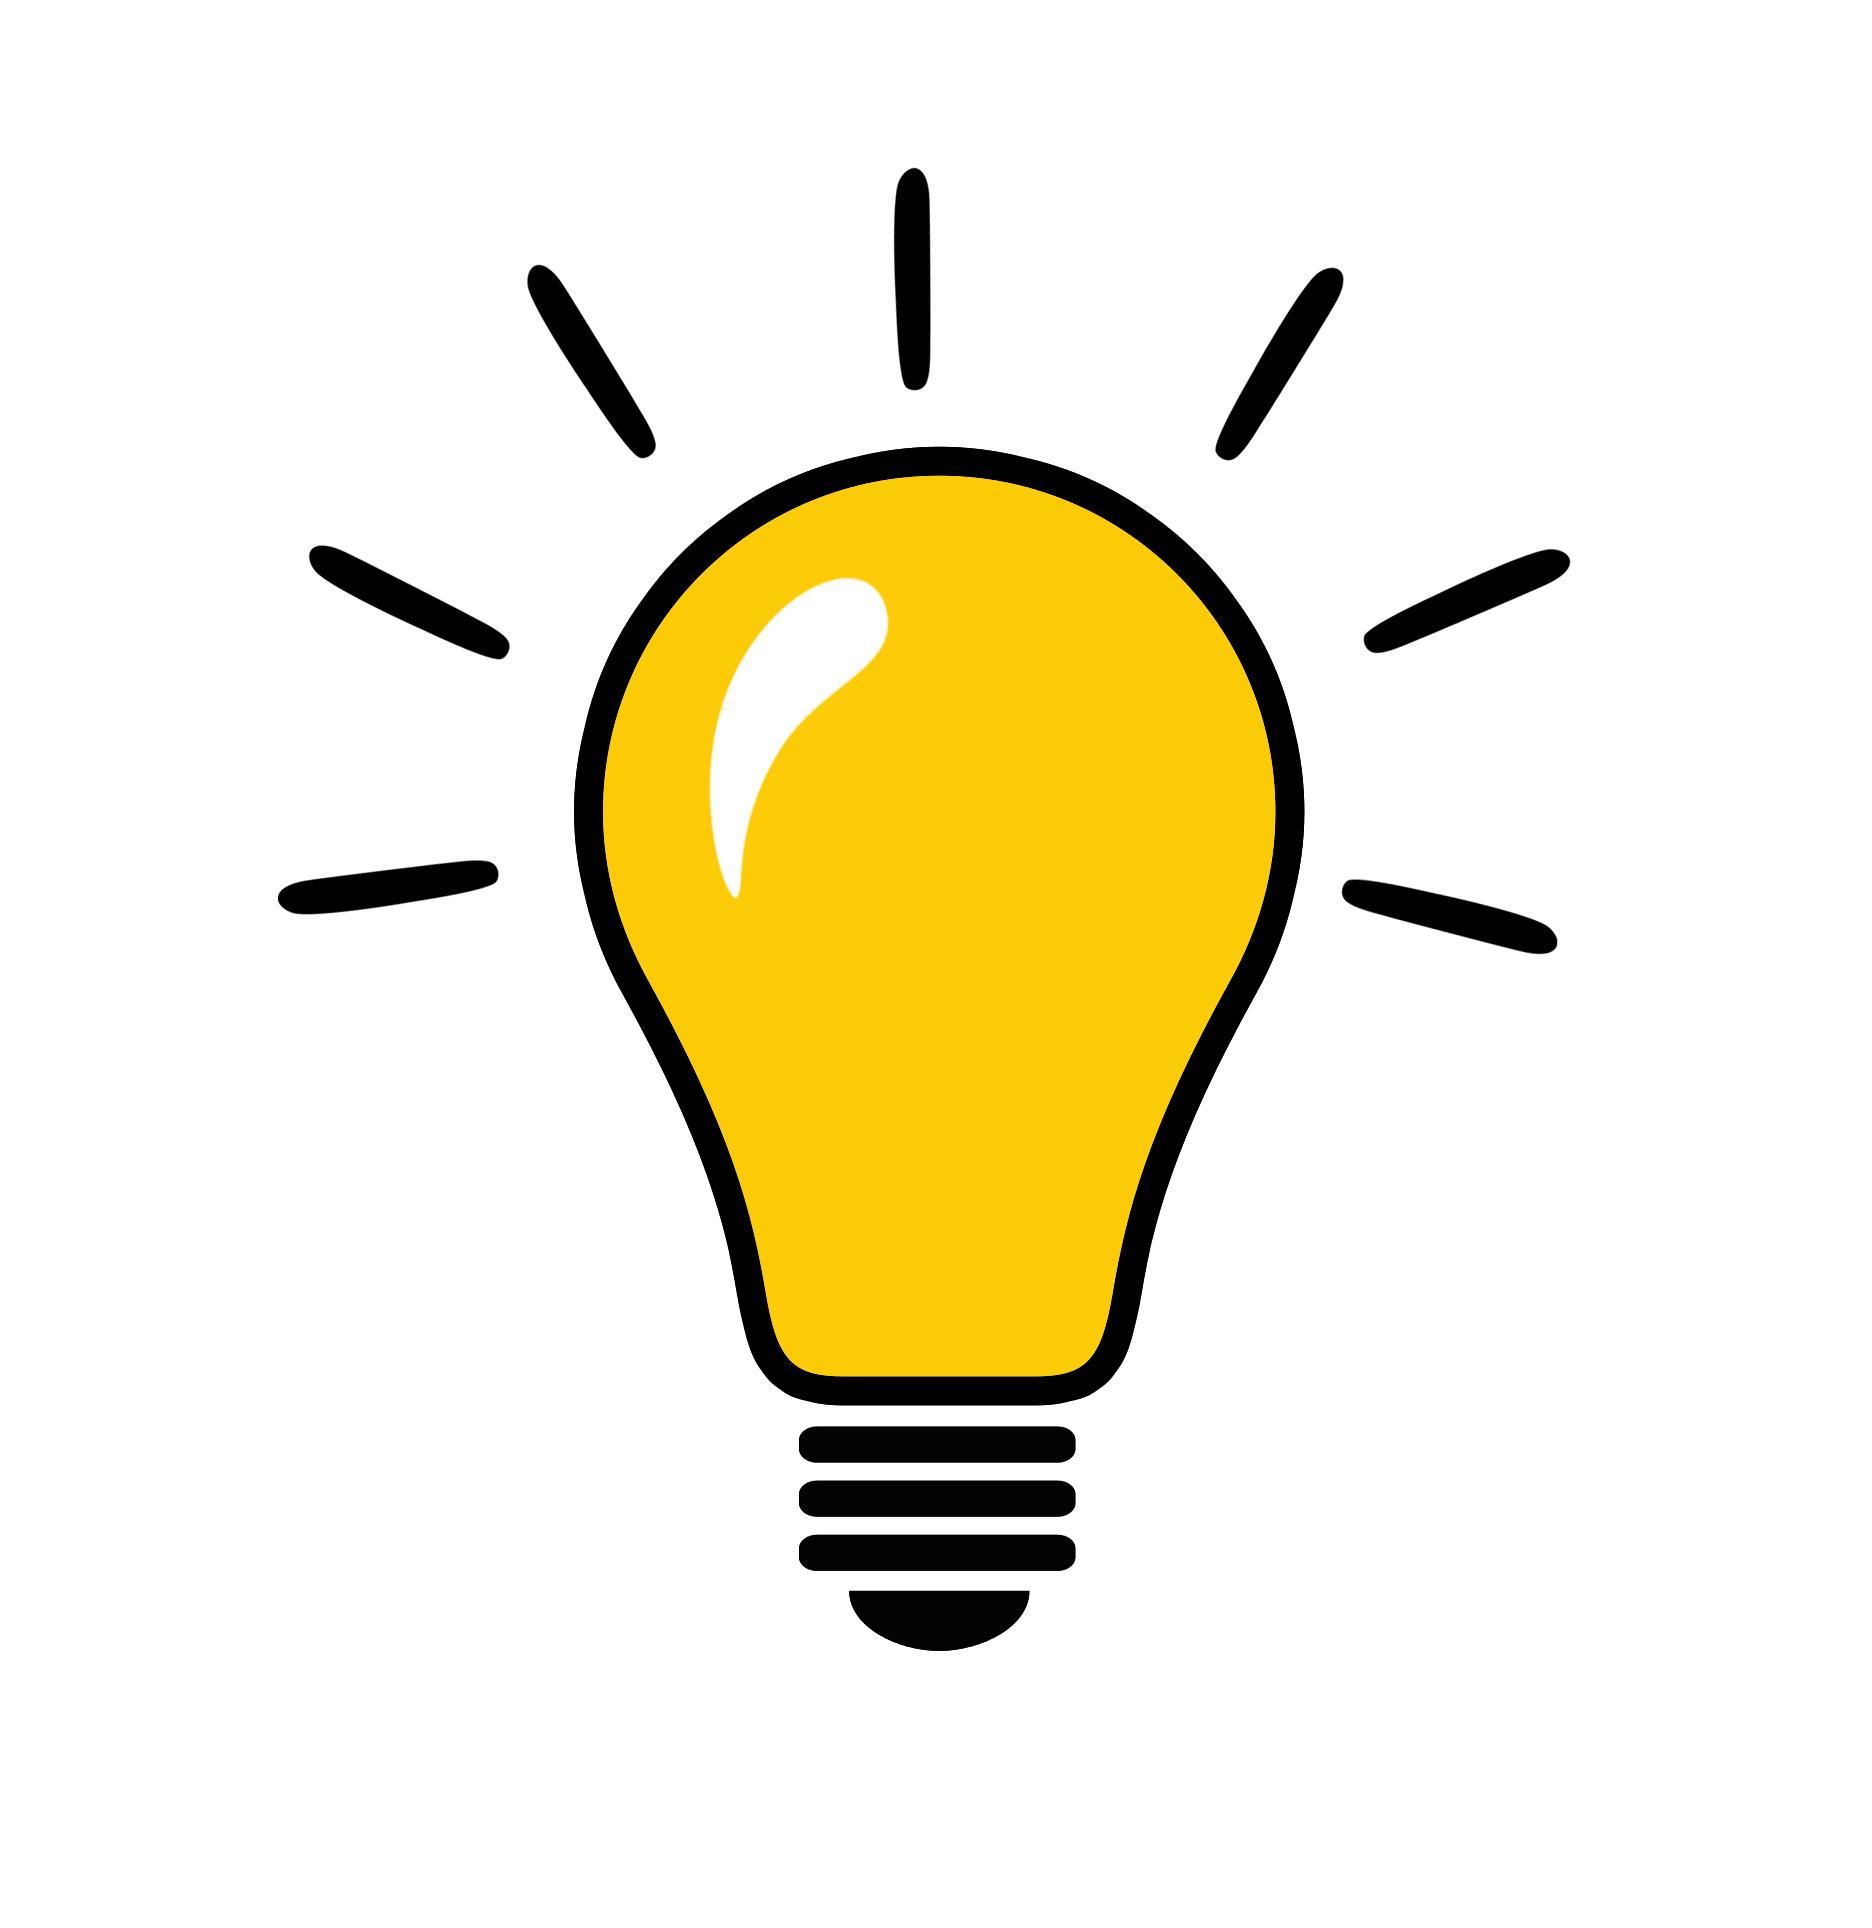 Light bulb ideas, Abstract, New, Innovation, Inspiration, HQ Photo